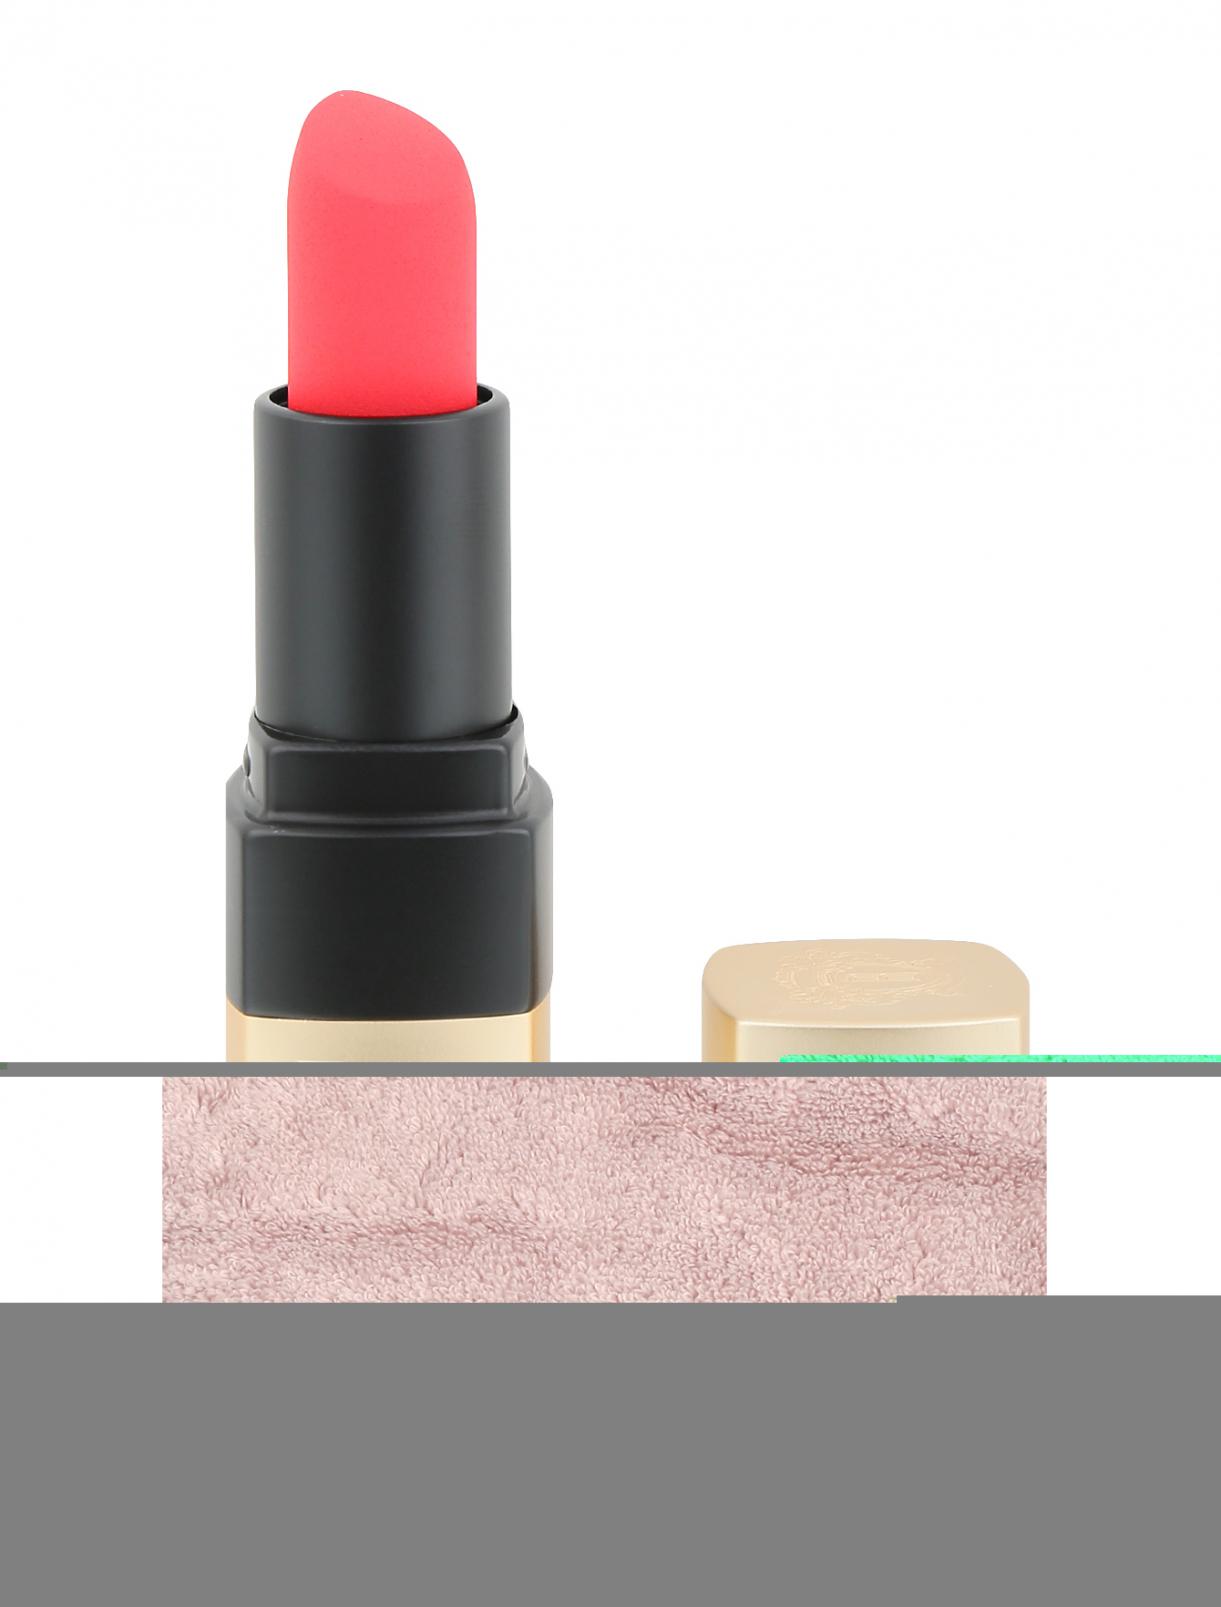 Помада On Fire Makeup Bobbi Brown  –  Общий вид